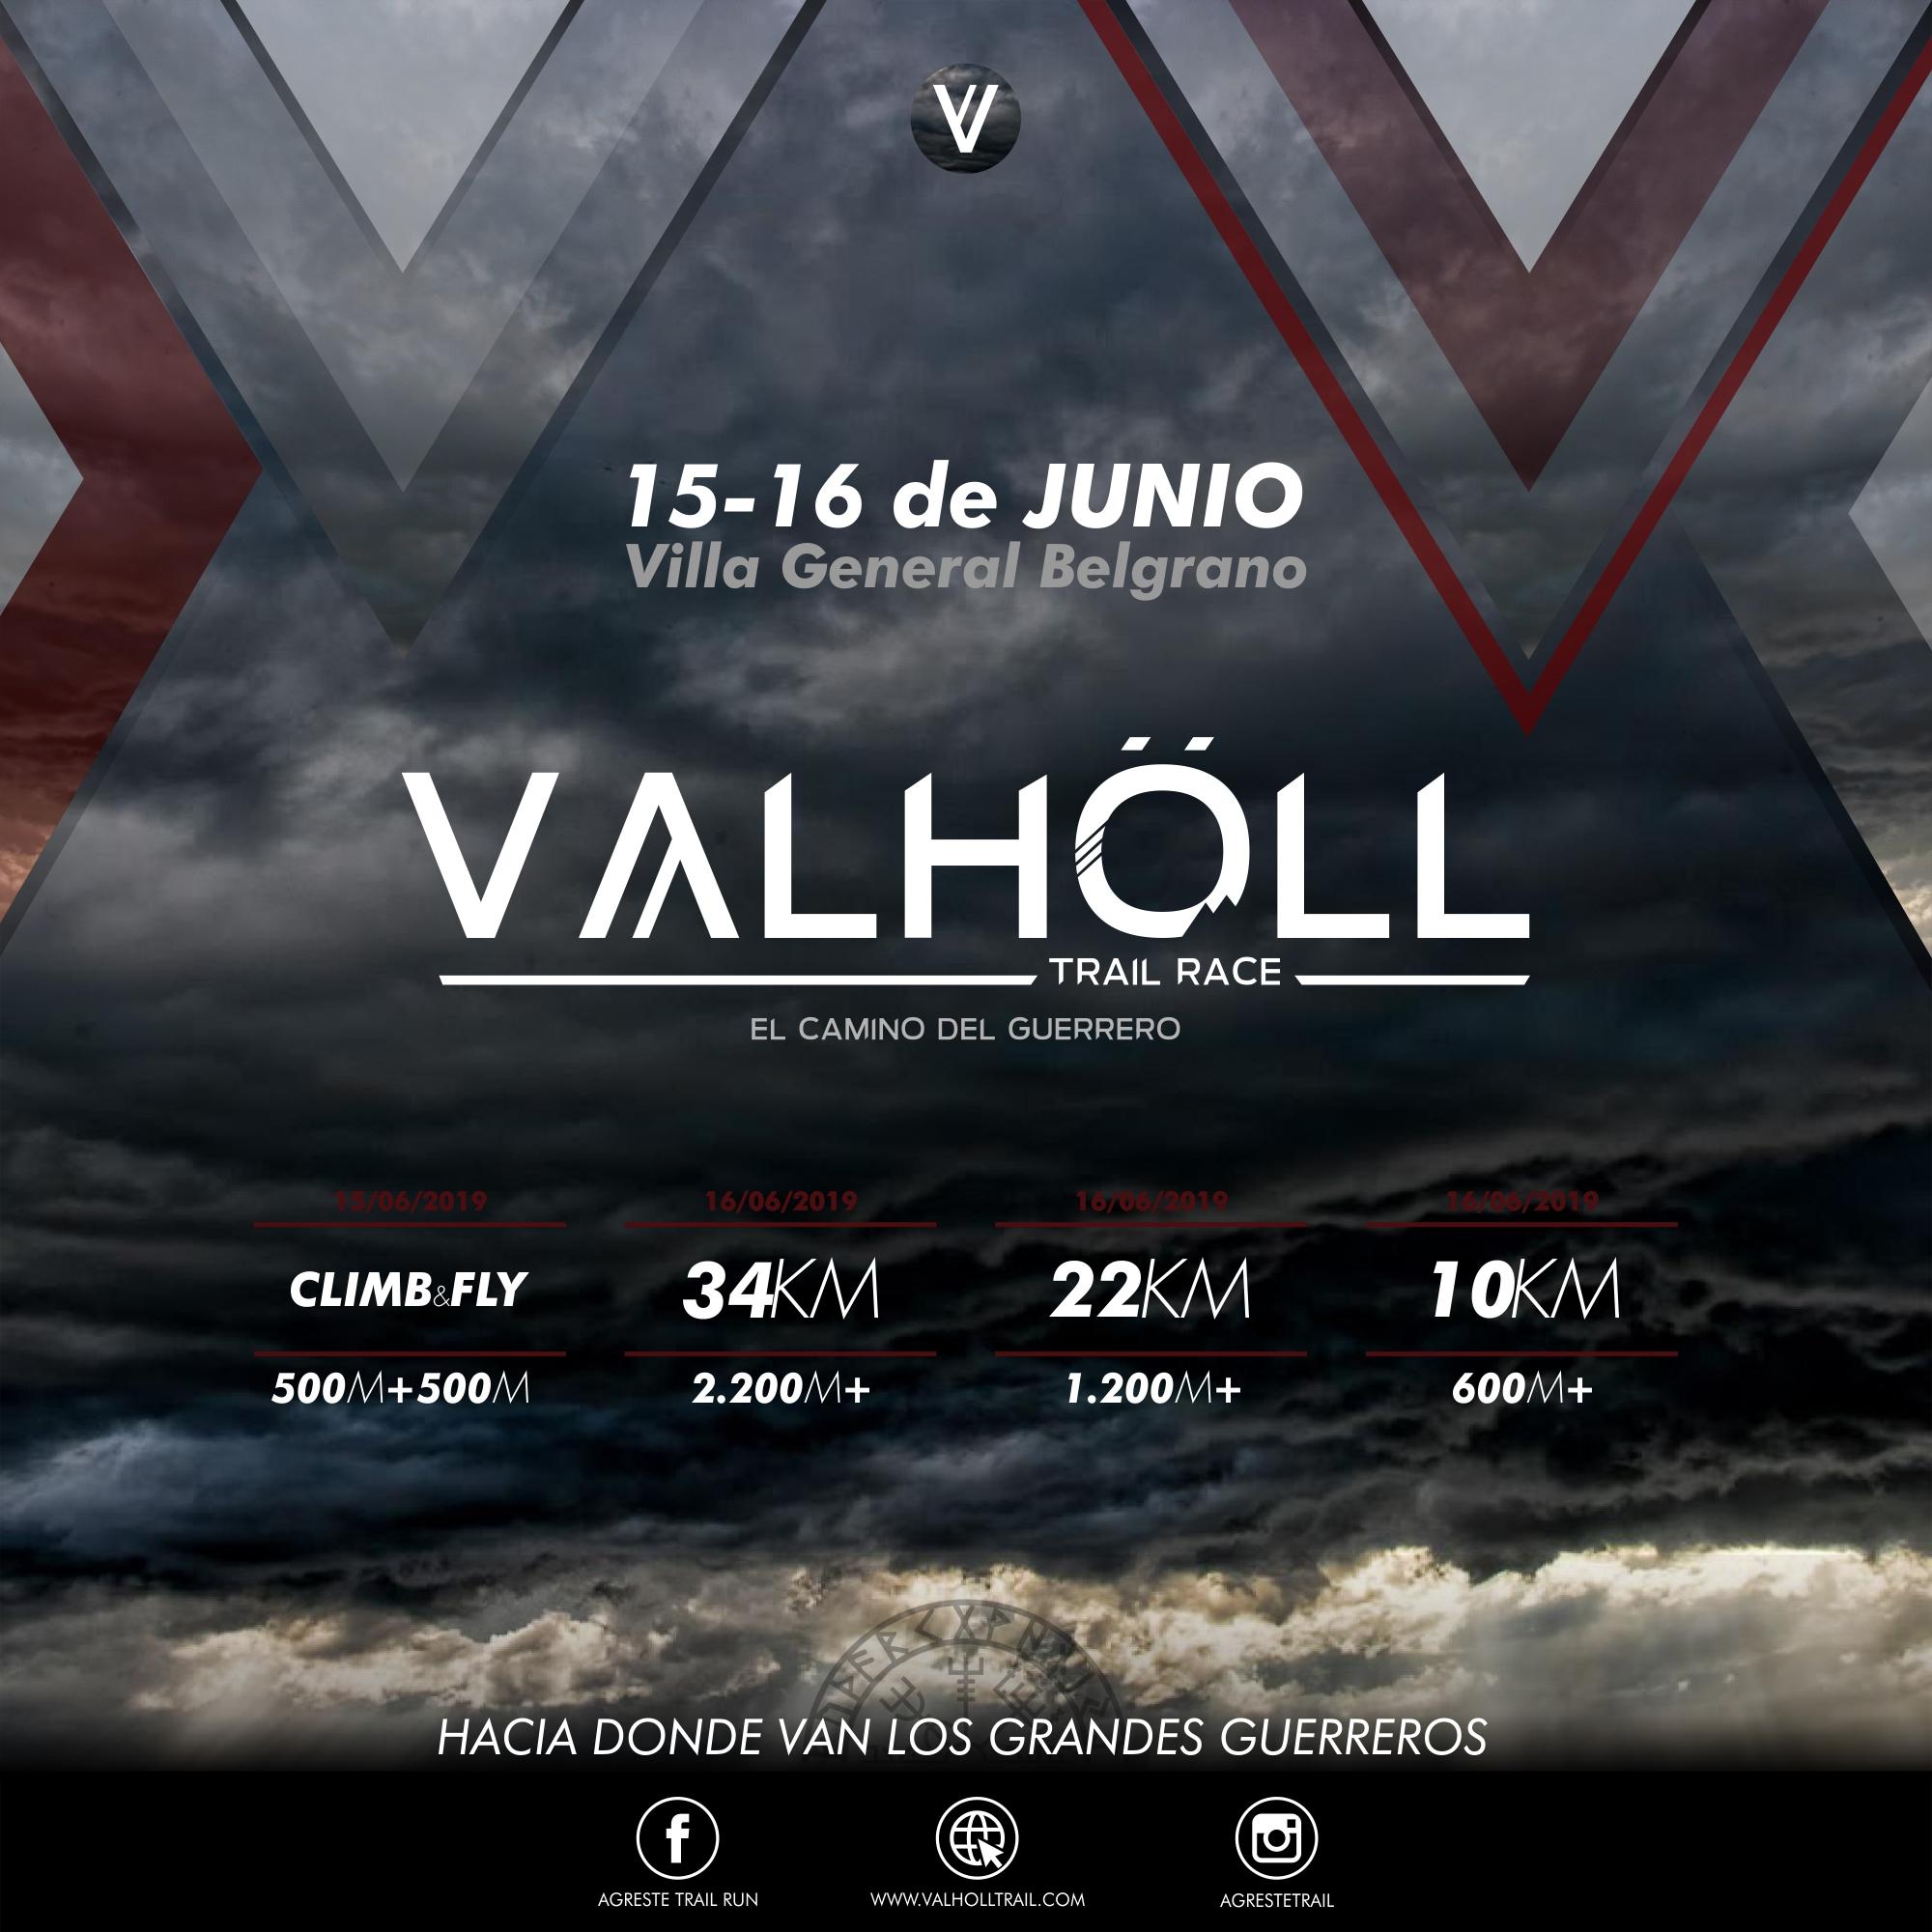 VALHÖLL TRAIL RACE en Villa General Belgrano